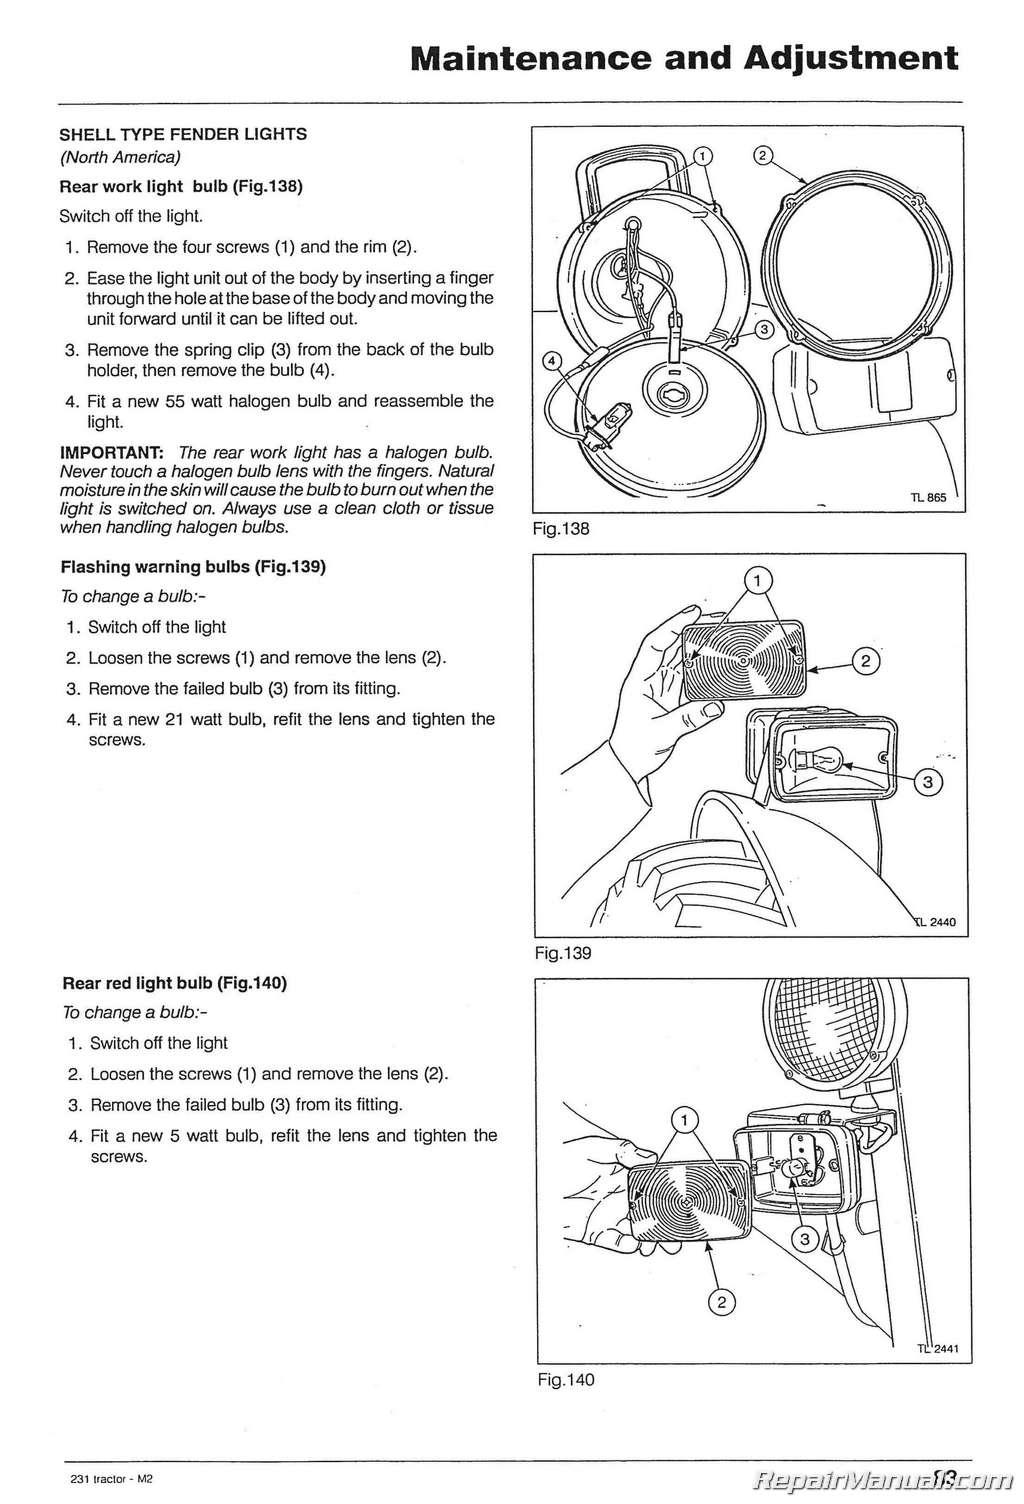 Massey ferguson 231 tractor operator instruction book.